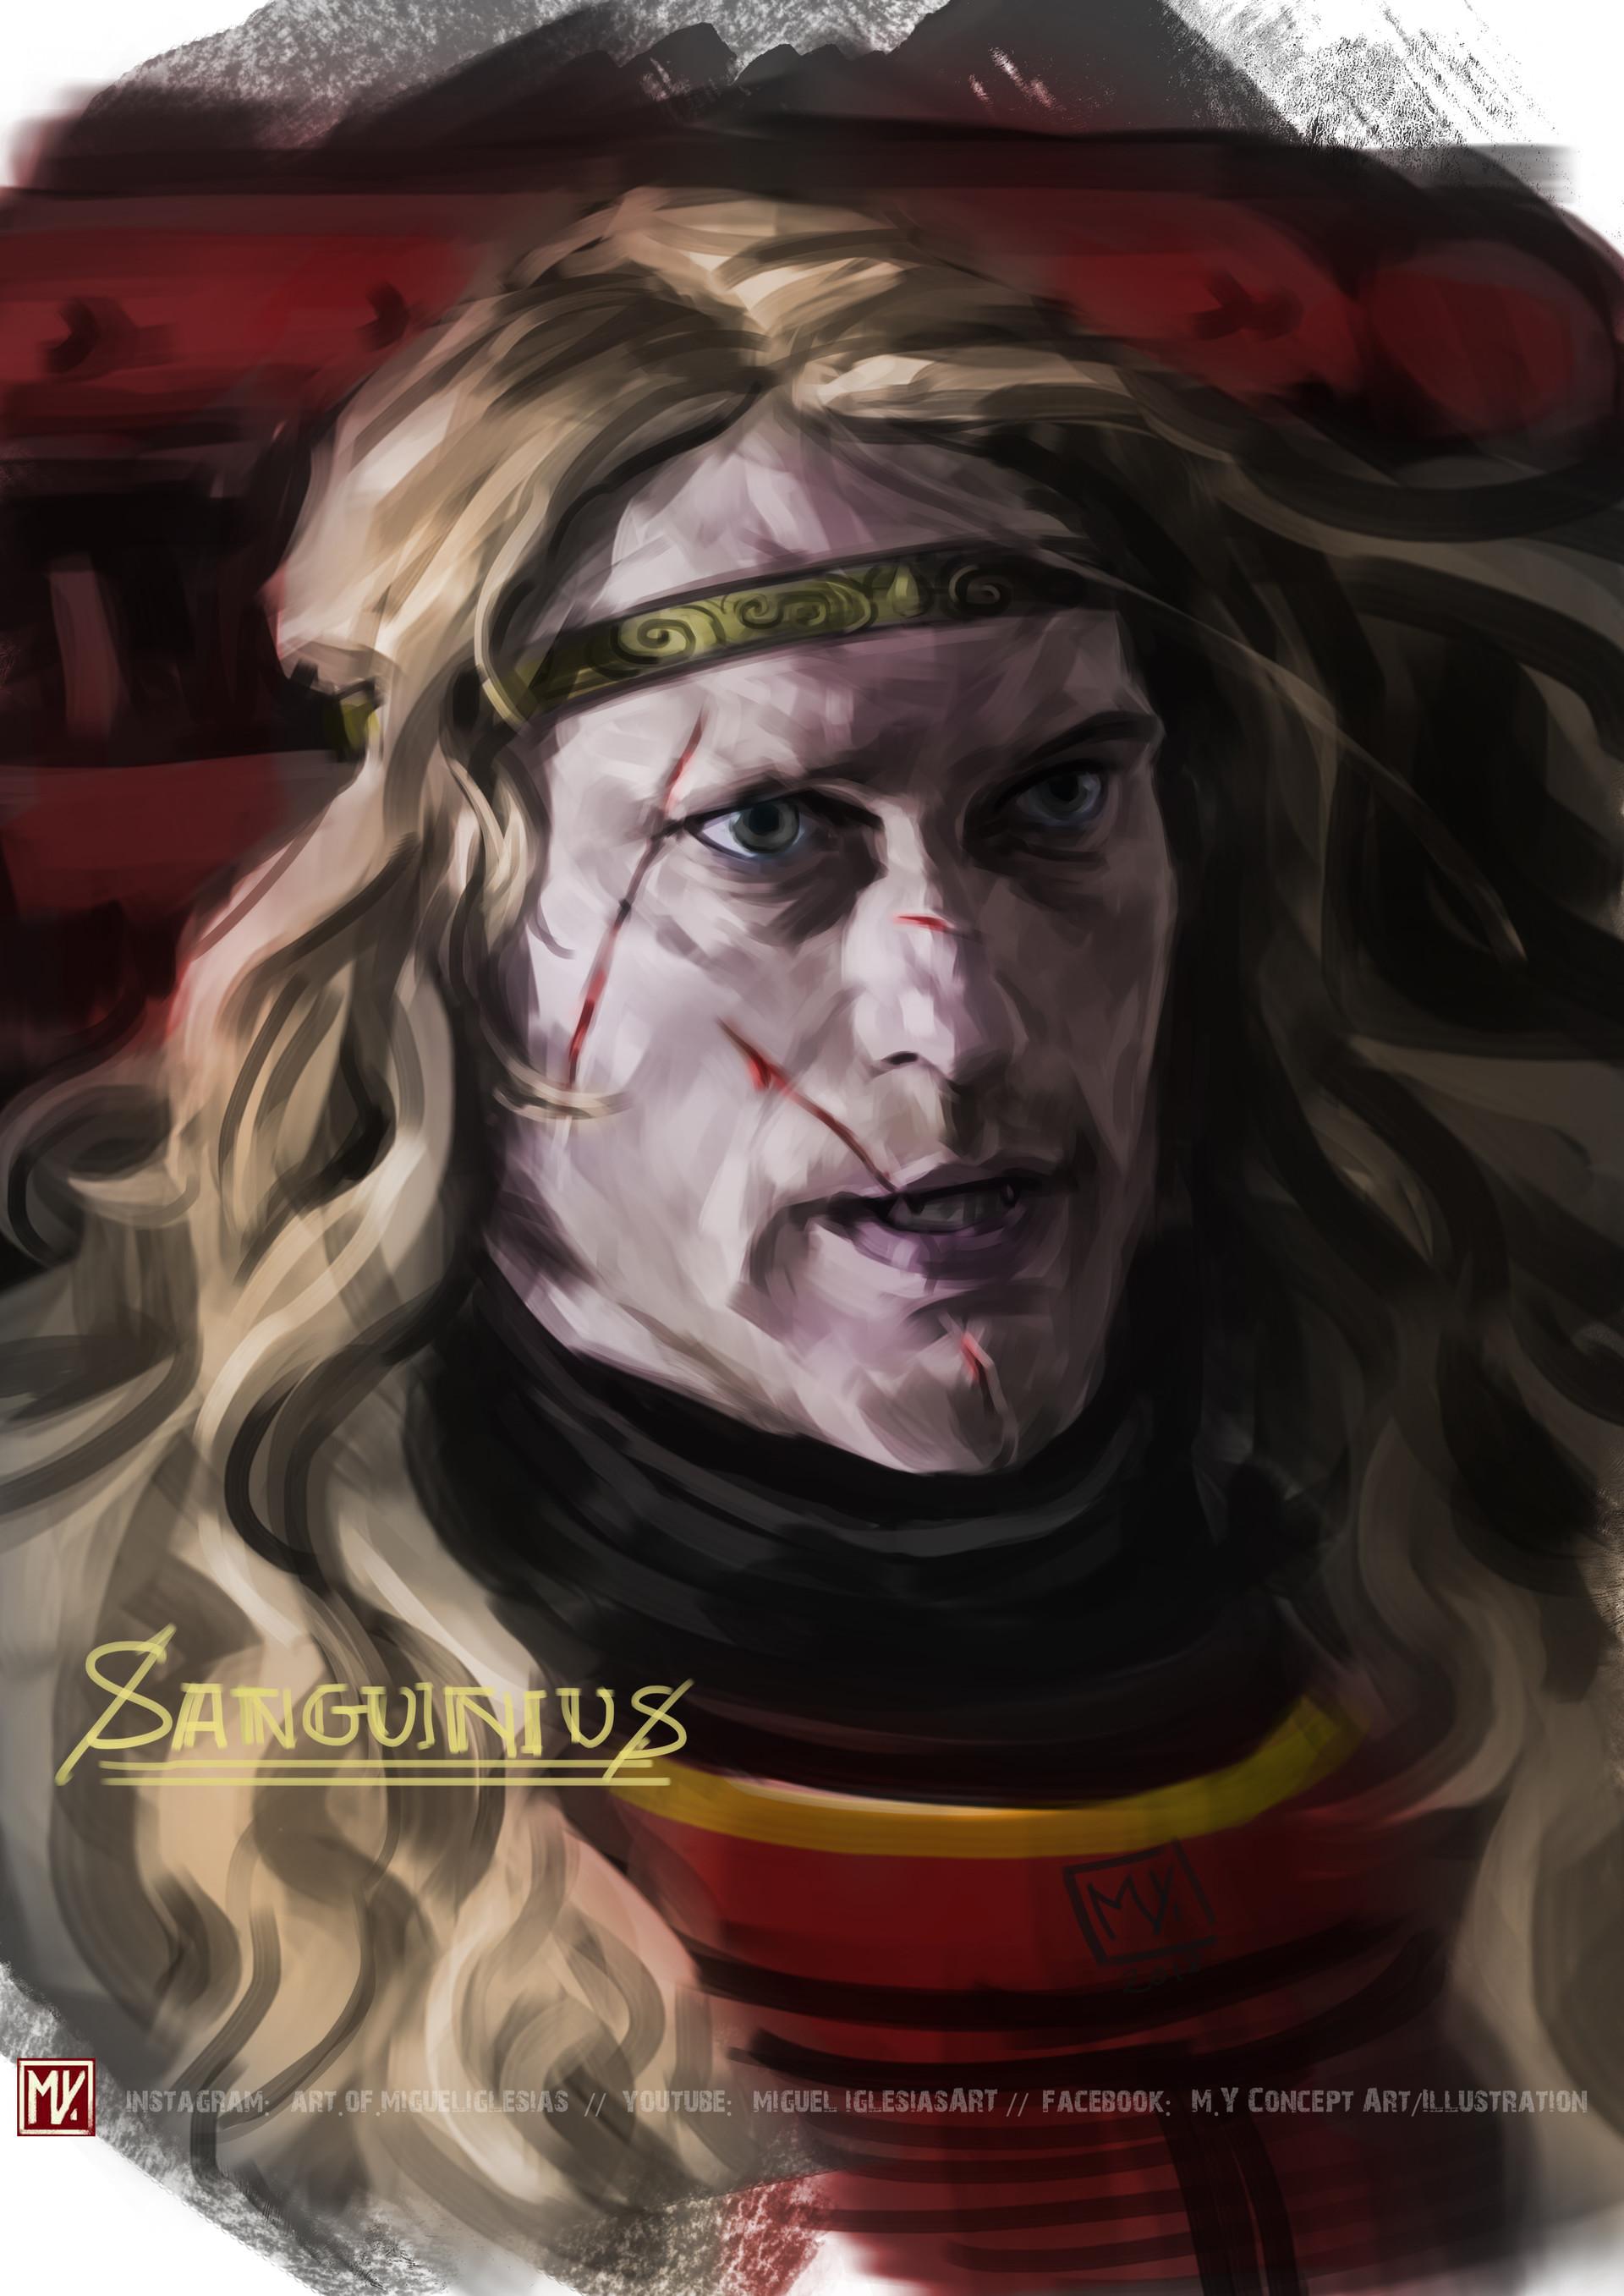 9 - Hy793m1 - Sanguinius, Primarch of the Blood Angels